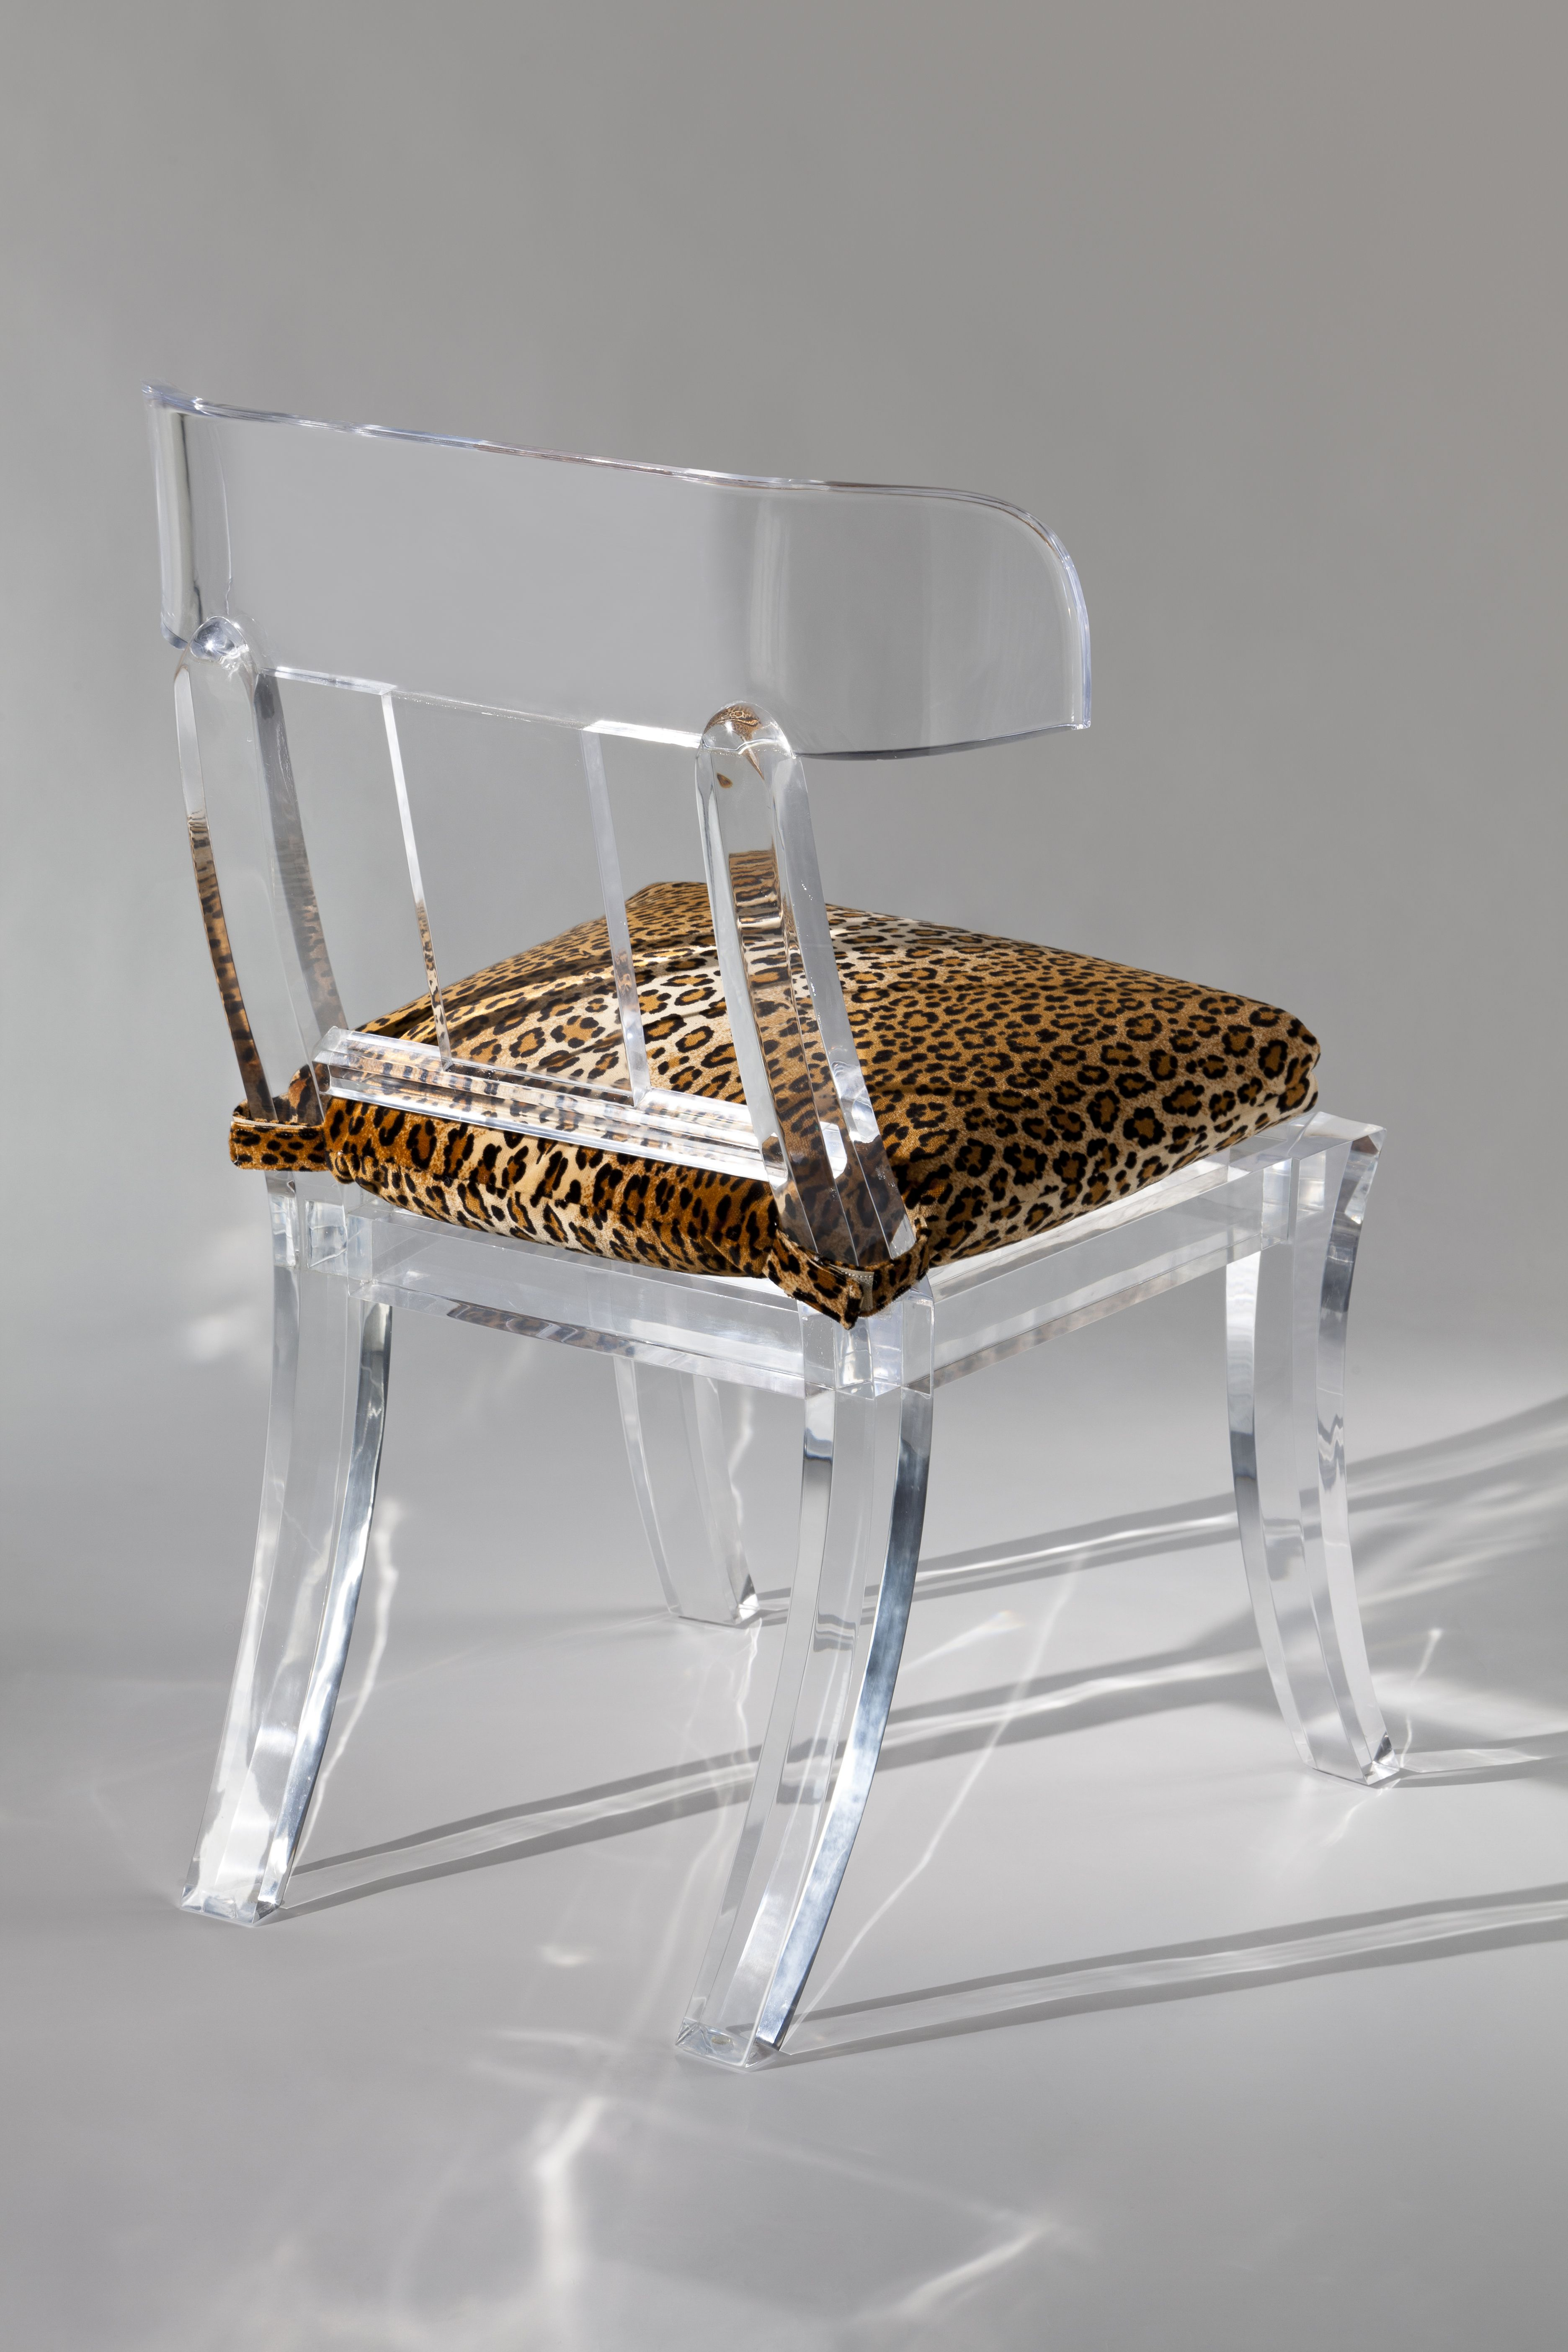 Lucite Furniture (With images) Lucite furniture